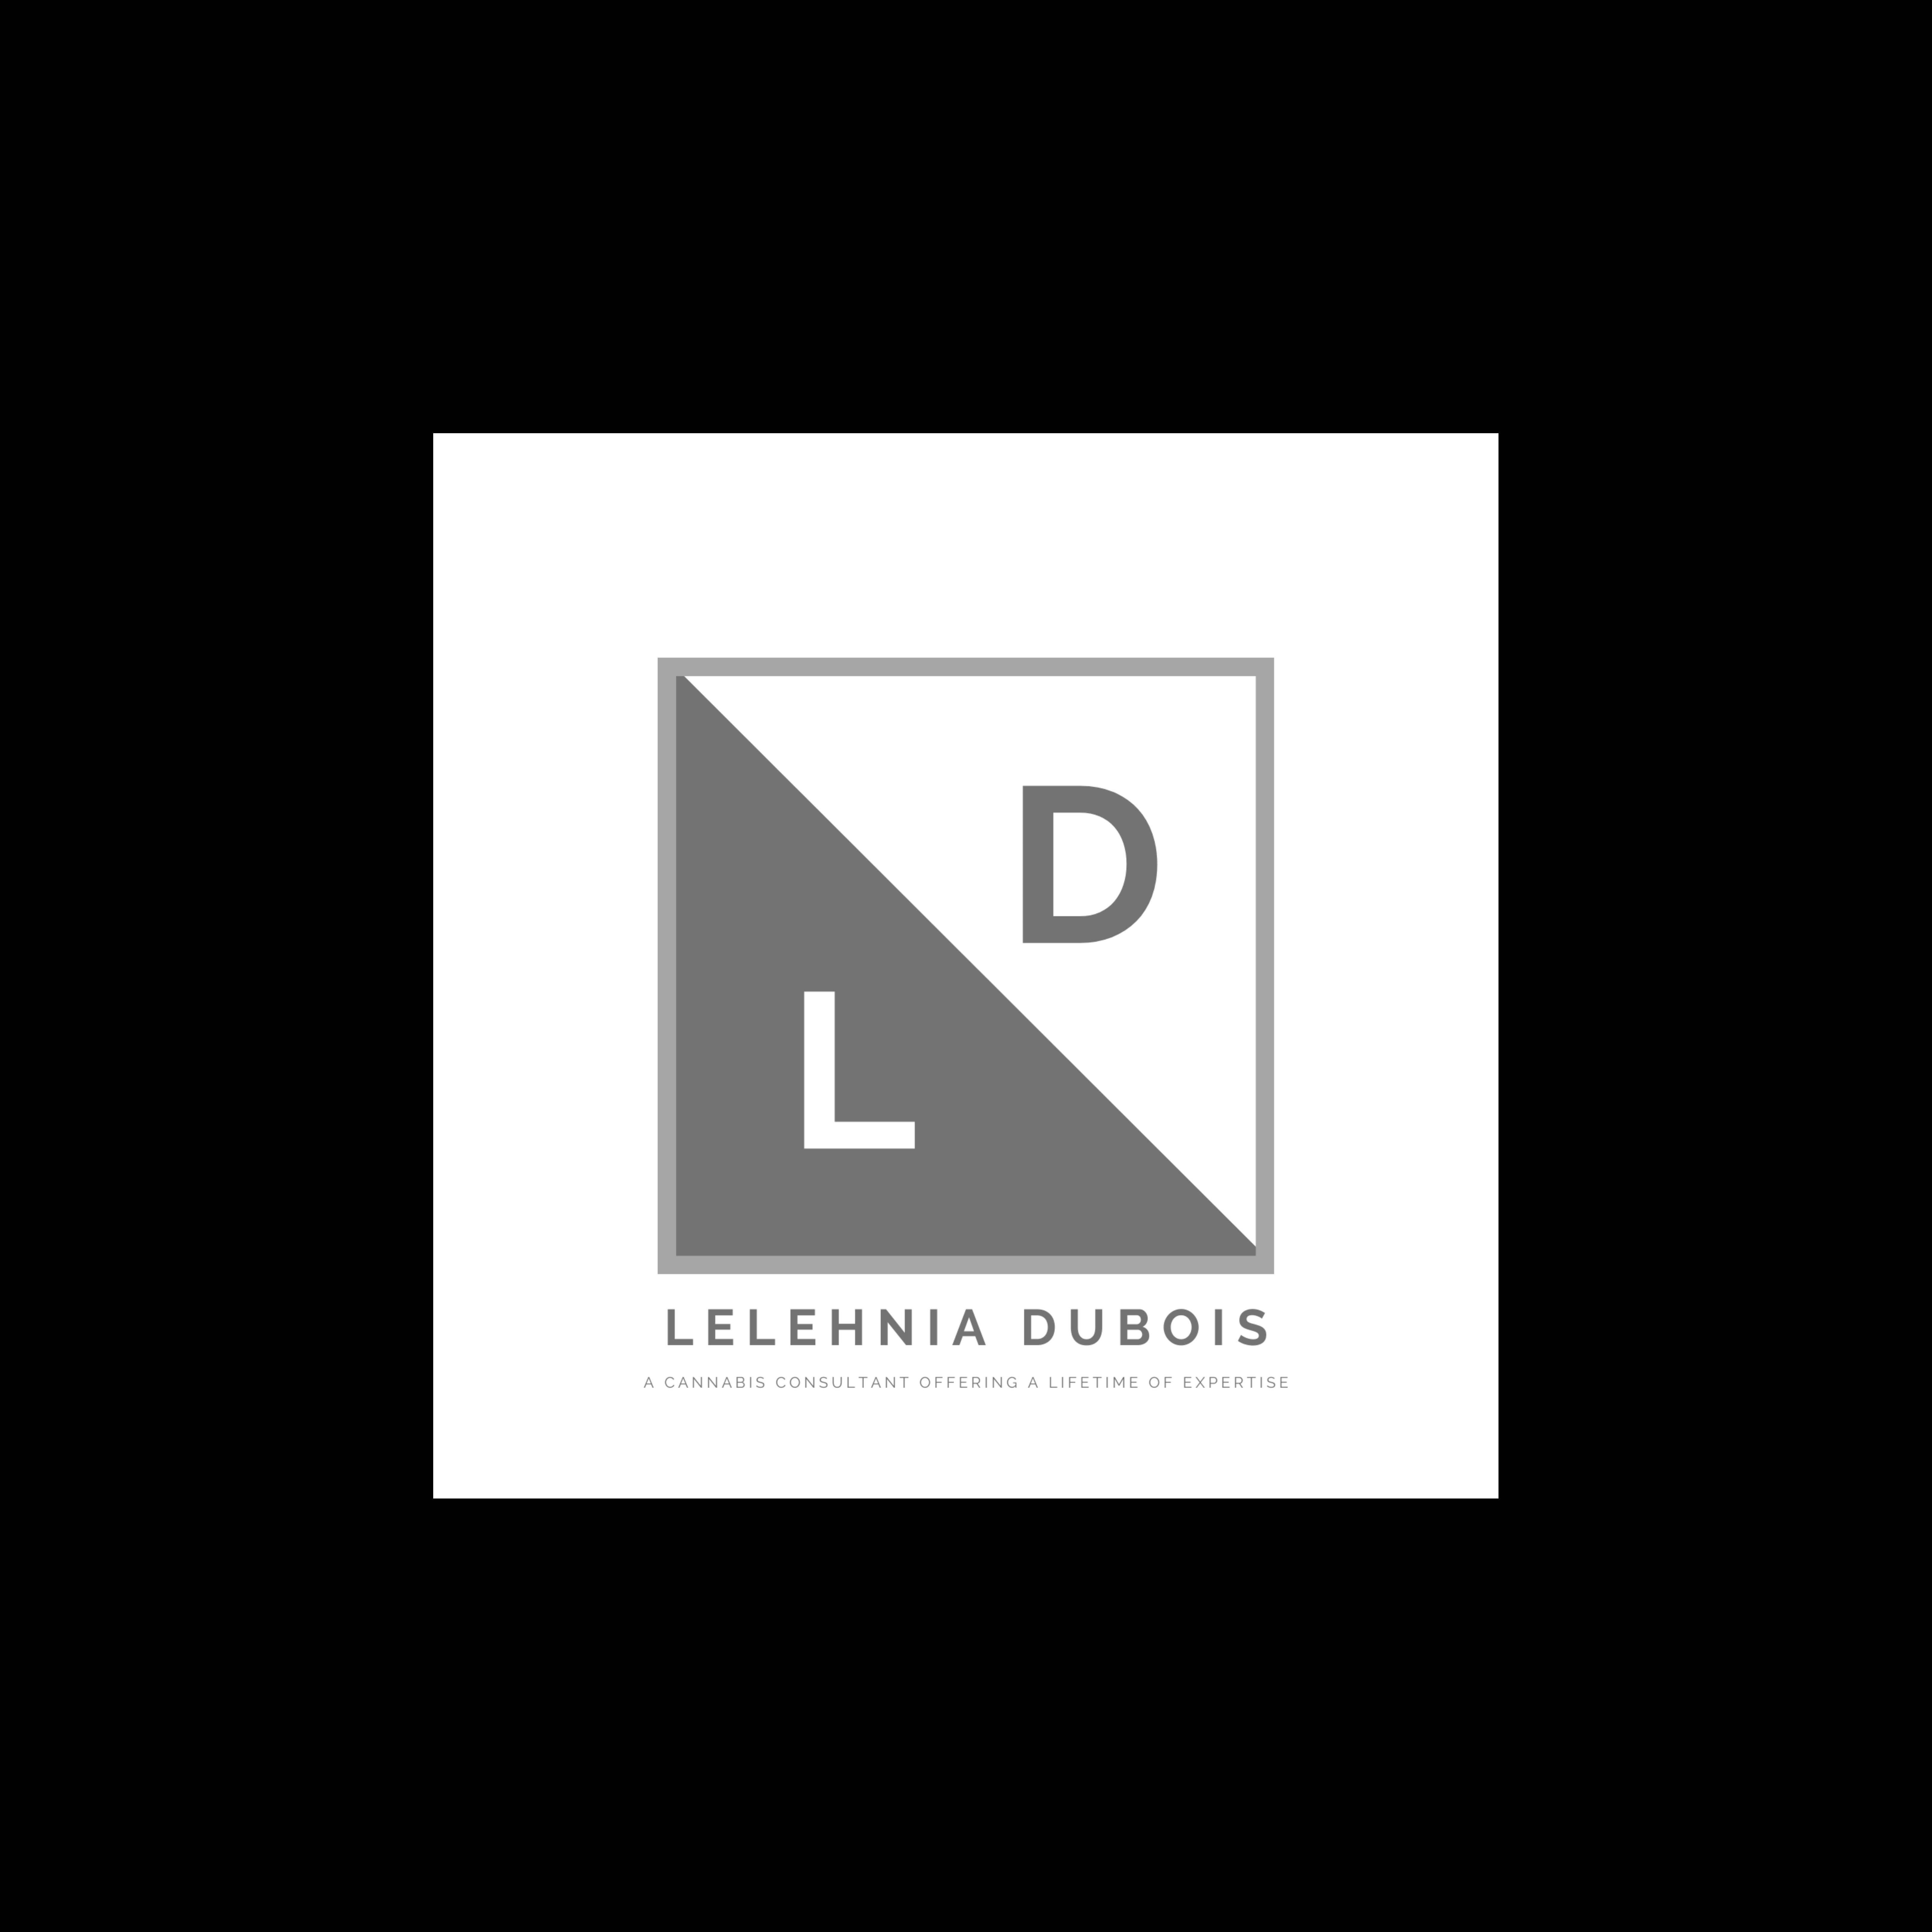 Lelehnia DuBois